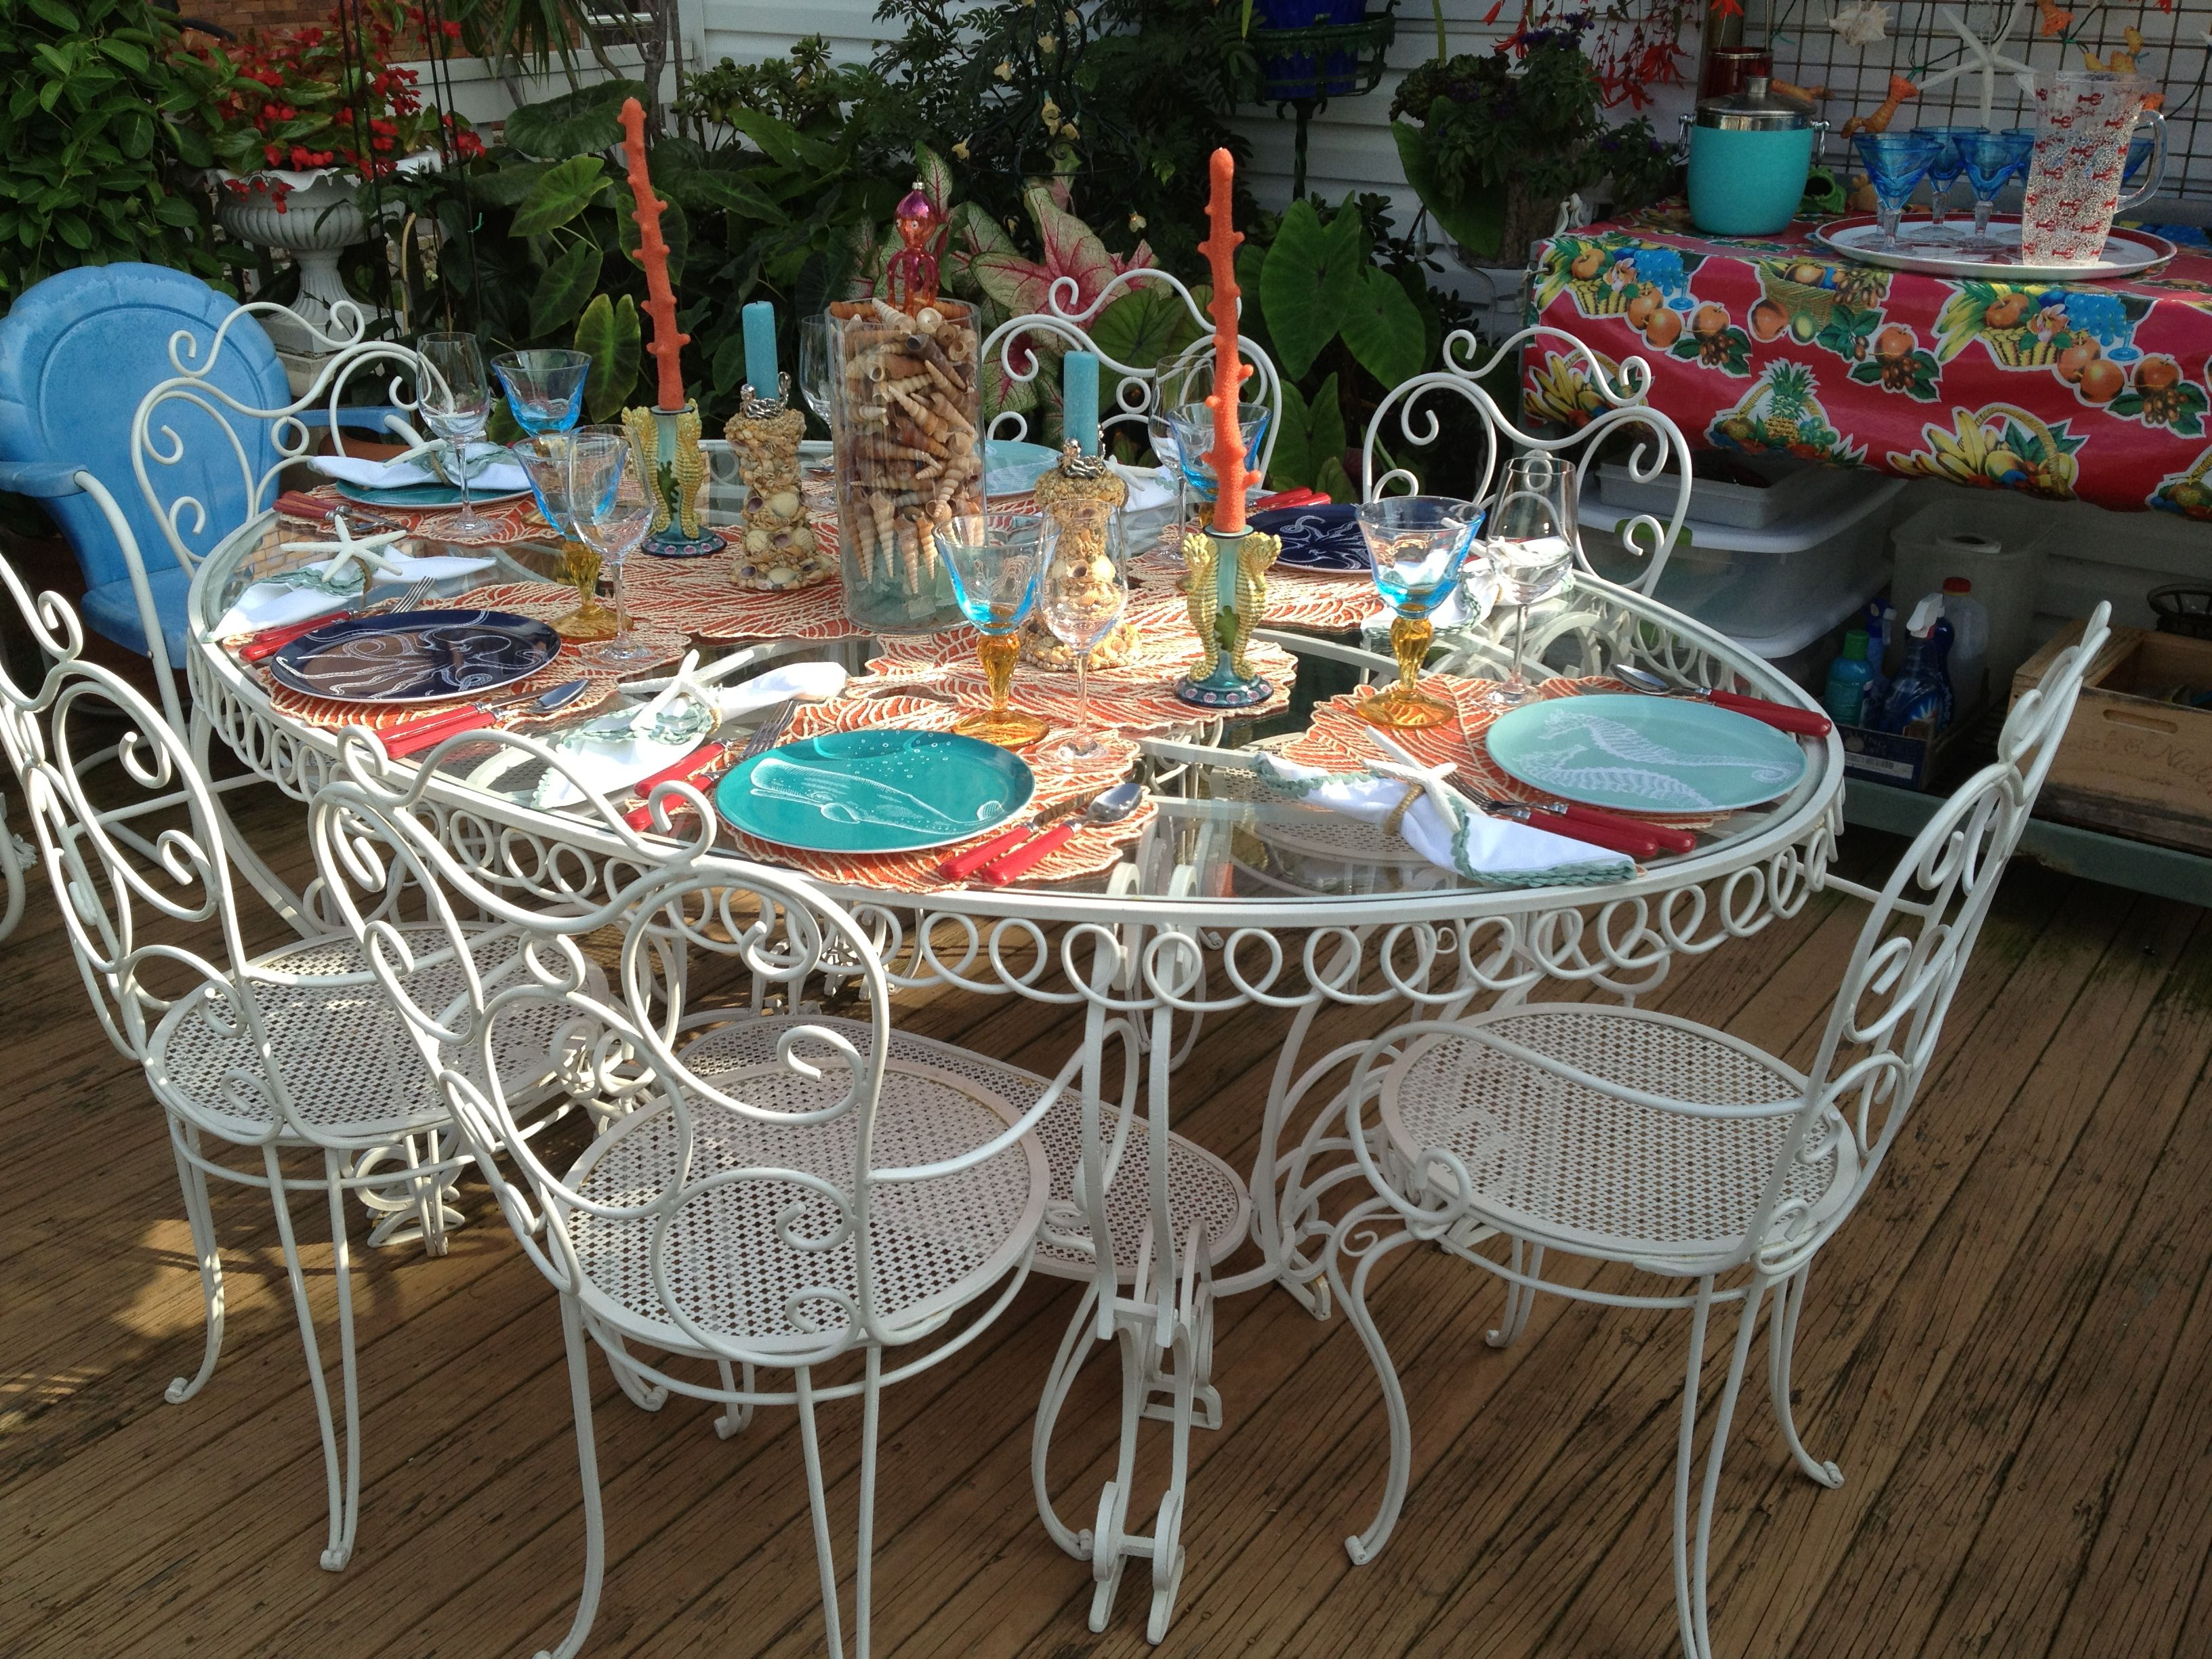 Table setting for late summer dinner party | Home decor | Pinterest ...